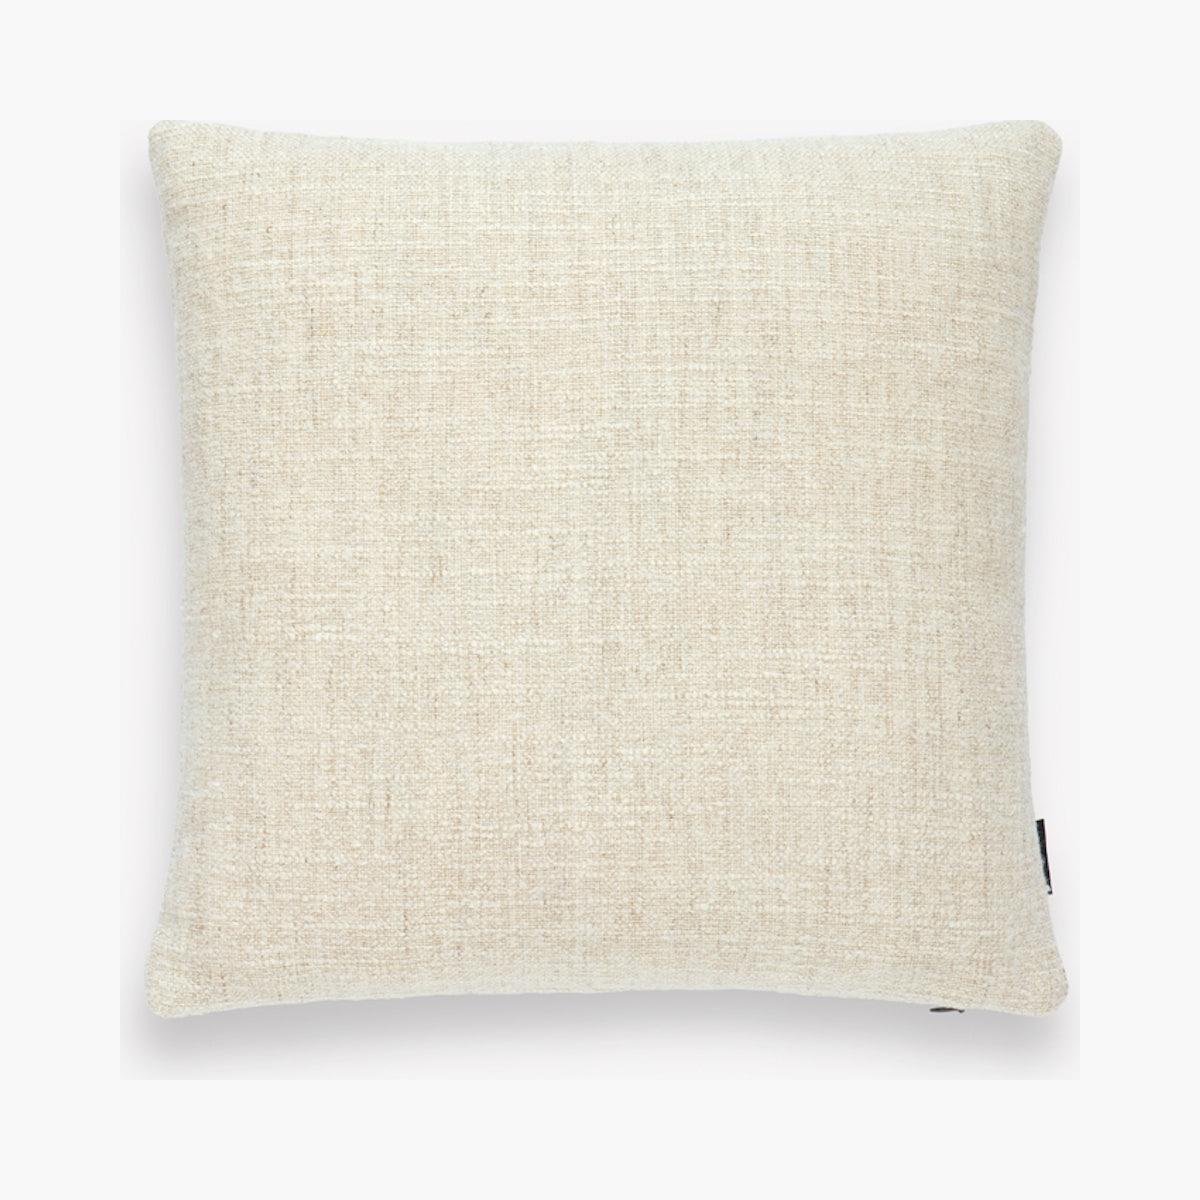 Plume Pillow